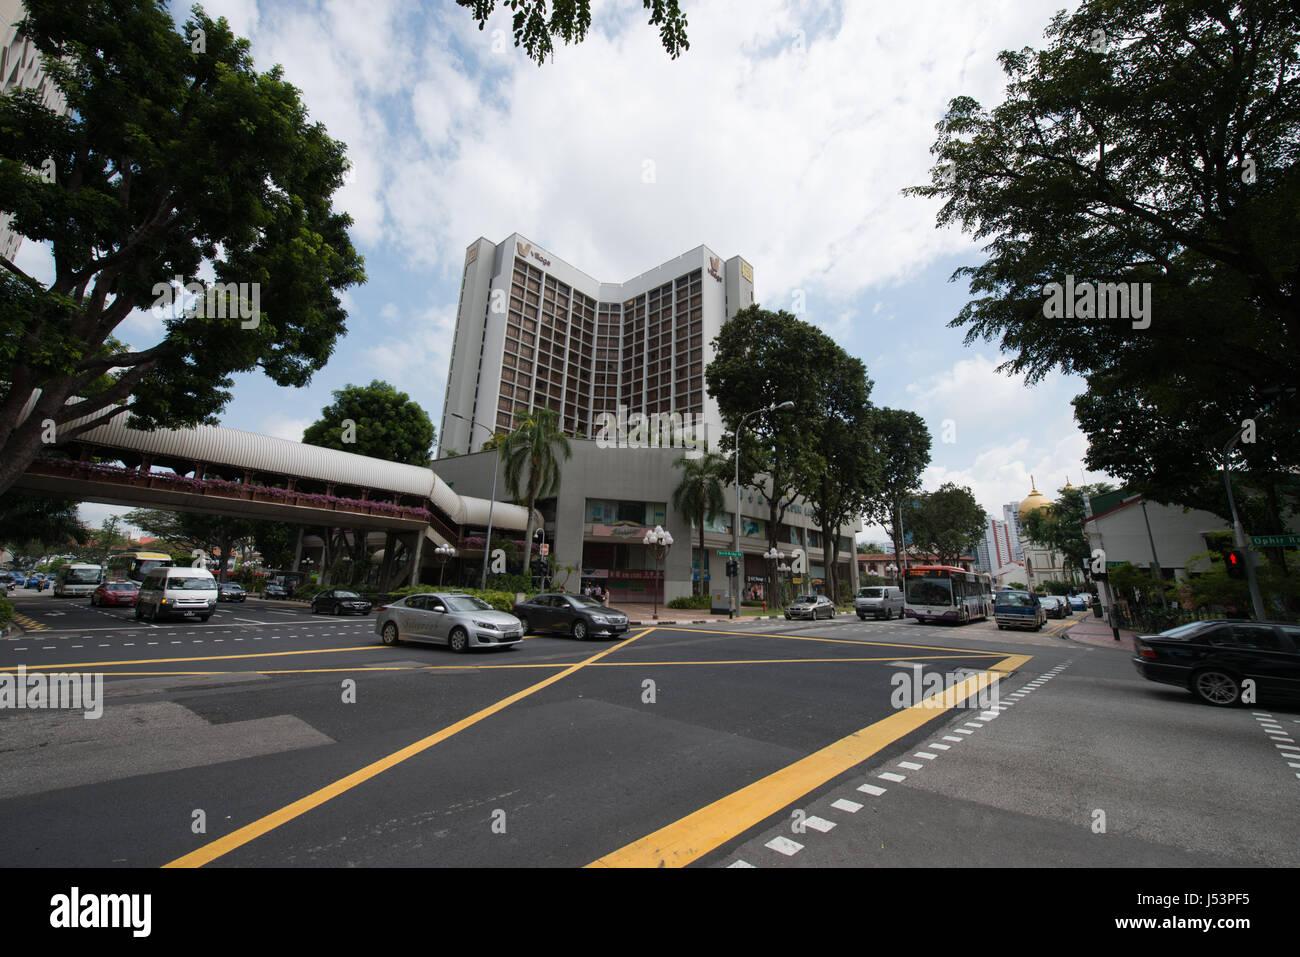 Ordinary street in Singapore - Stock Image